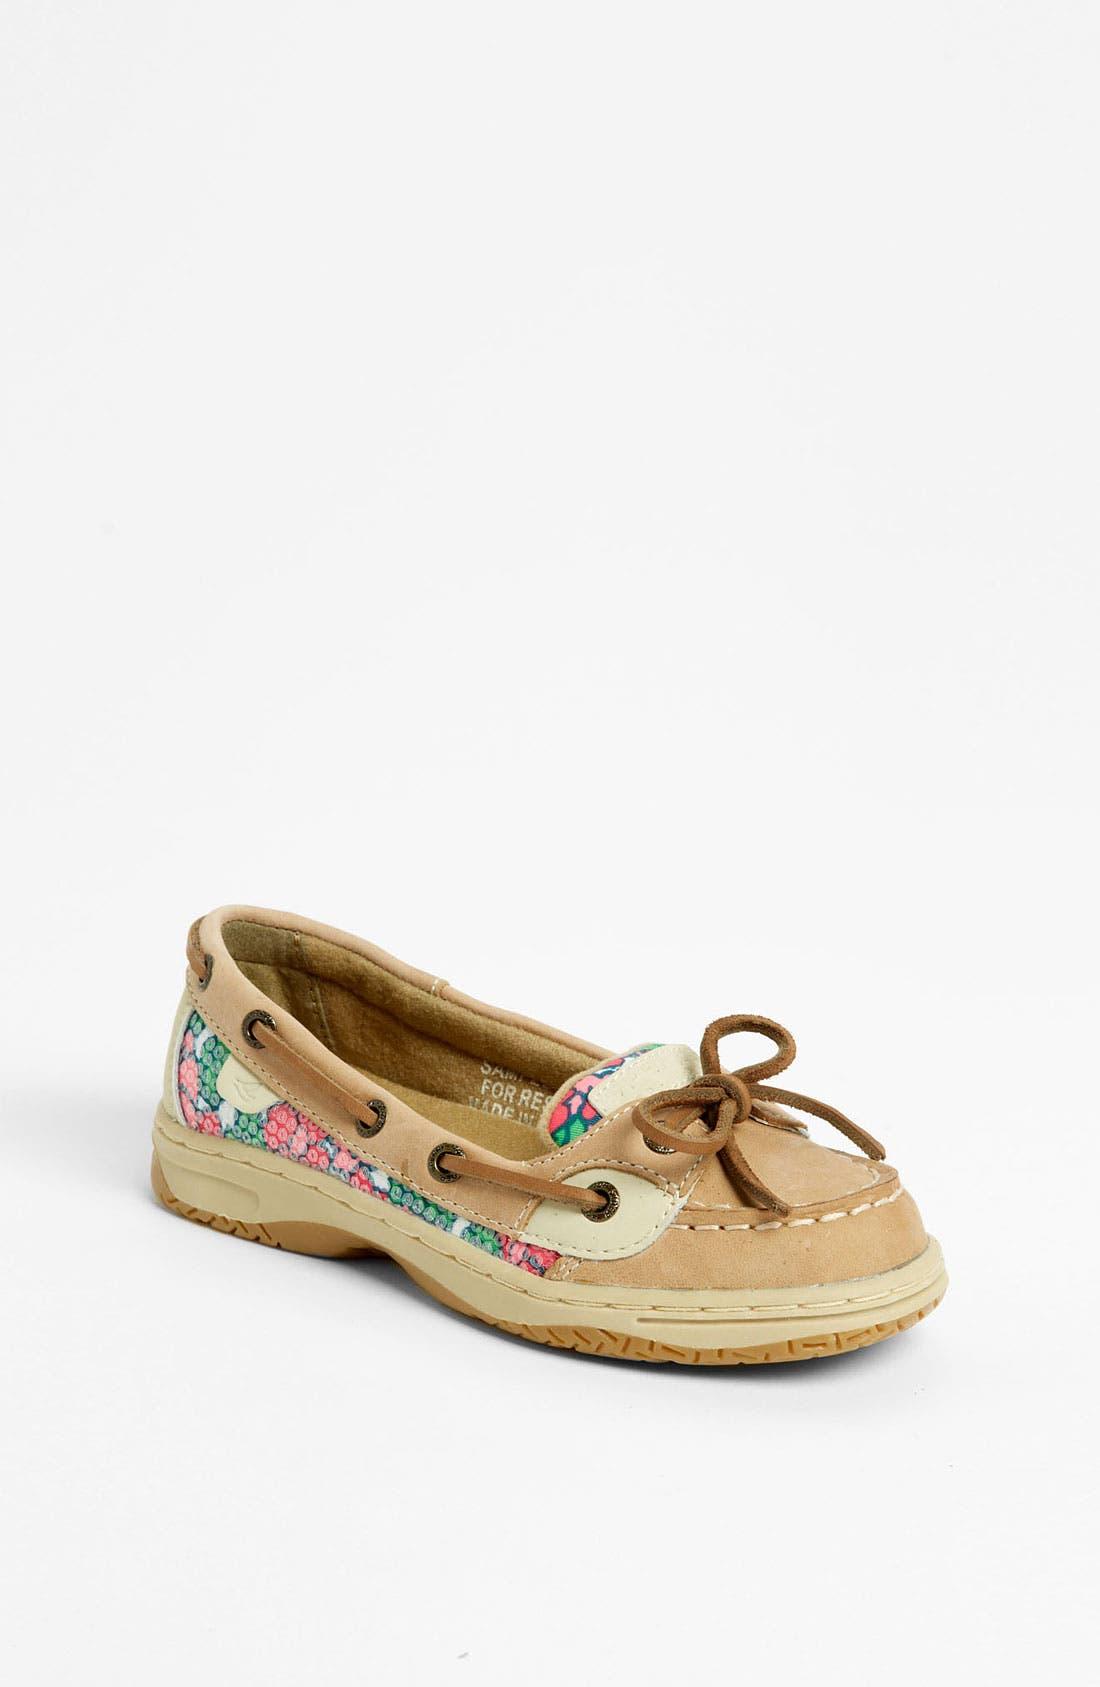 Alternate Image 1 Selected - Sperry Top-Sider® 'Angelfish' Boat Shoe (Little Kid & Big Kid)